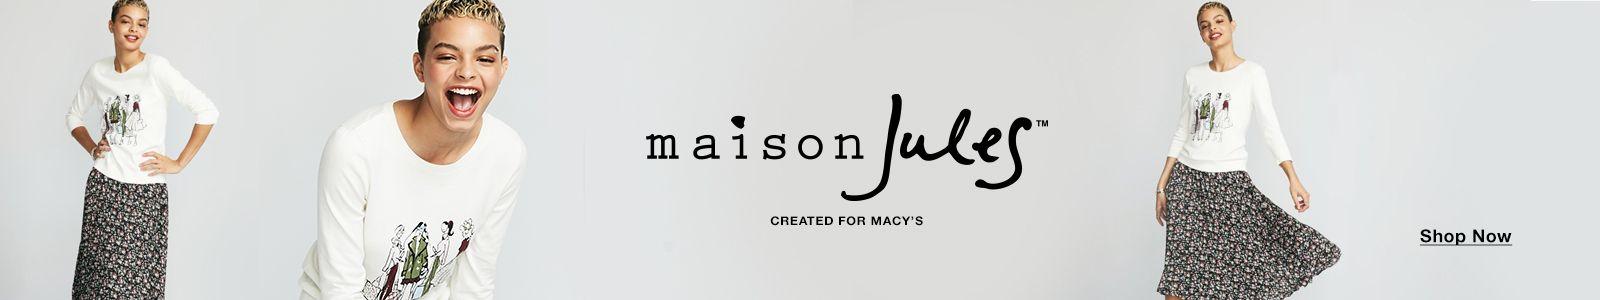 Maison jules, Created For Macys